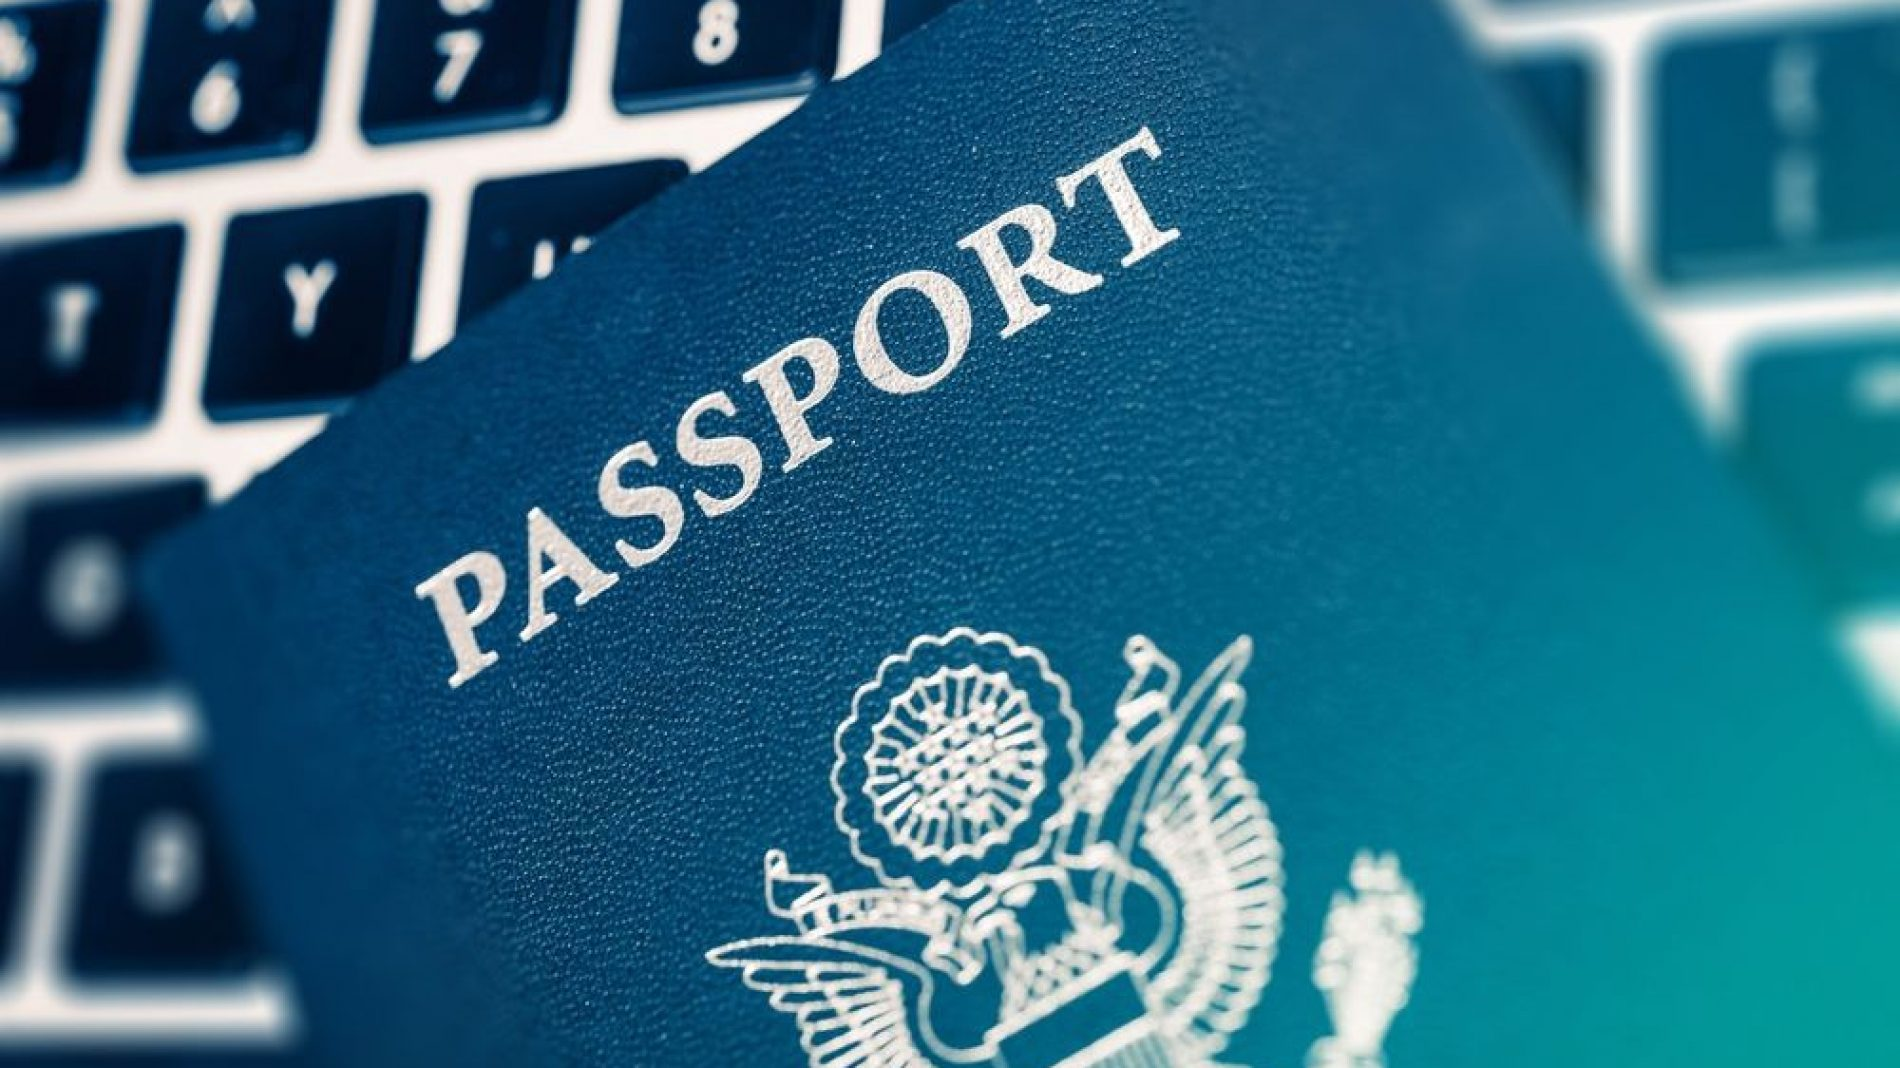 PassportKeyboard